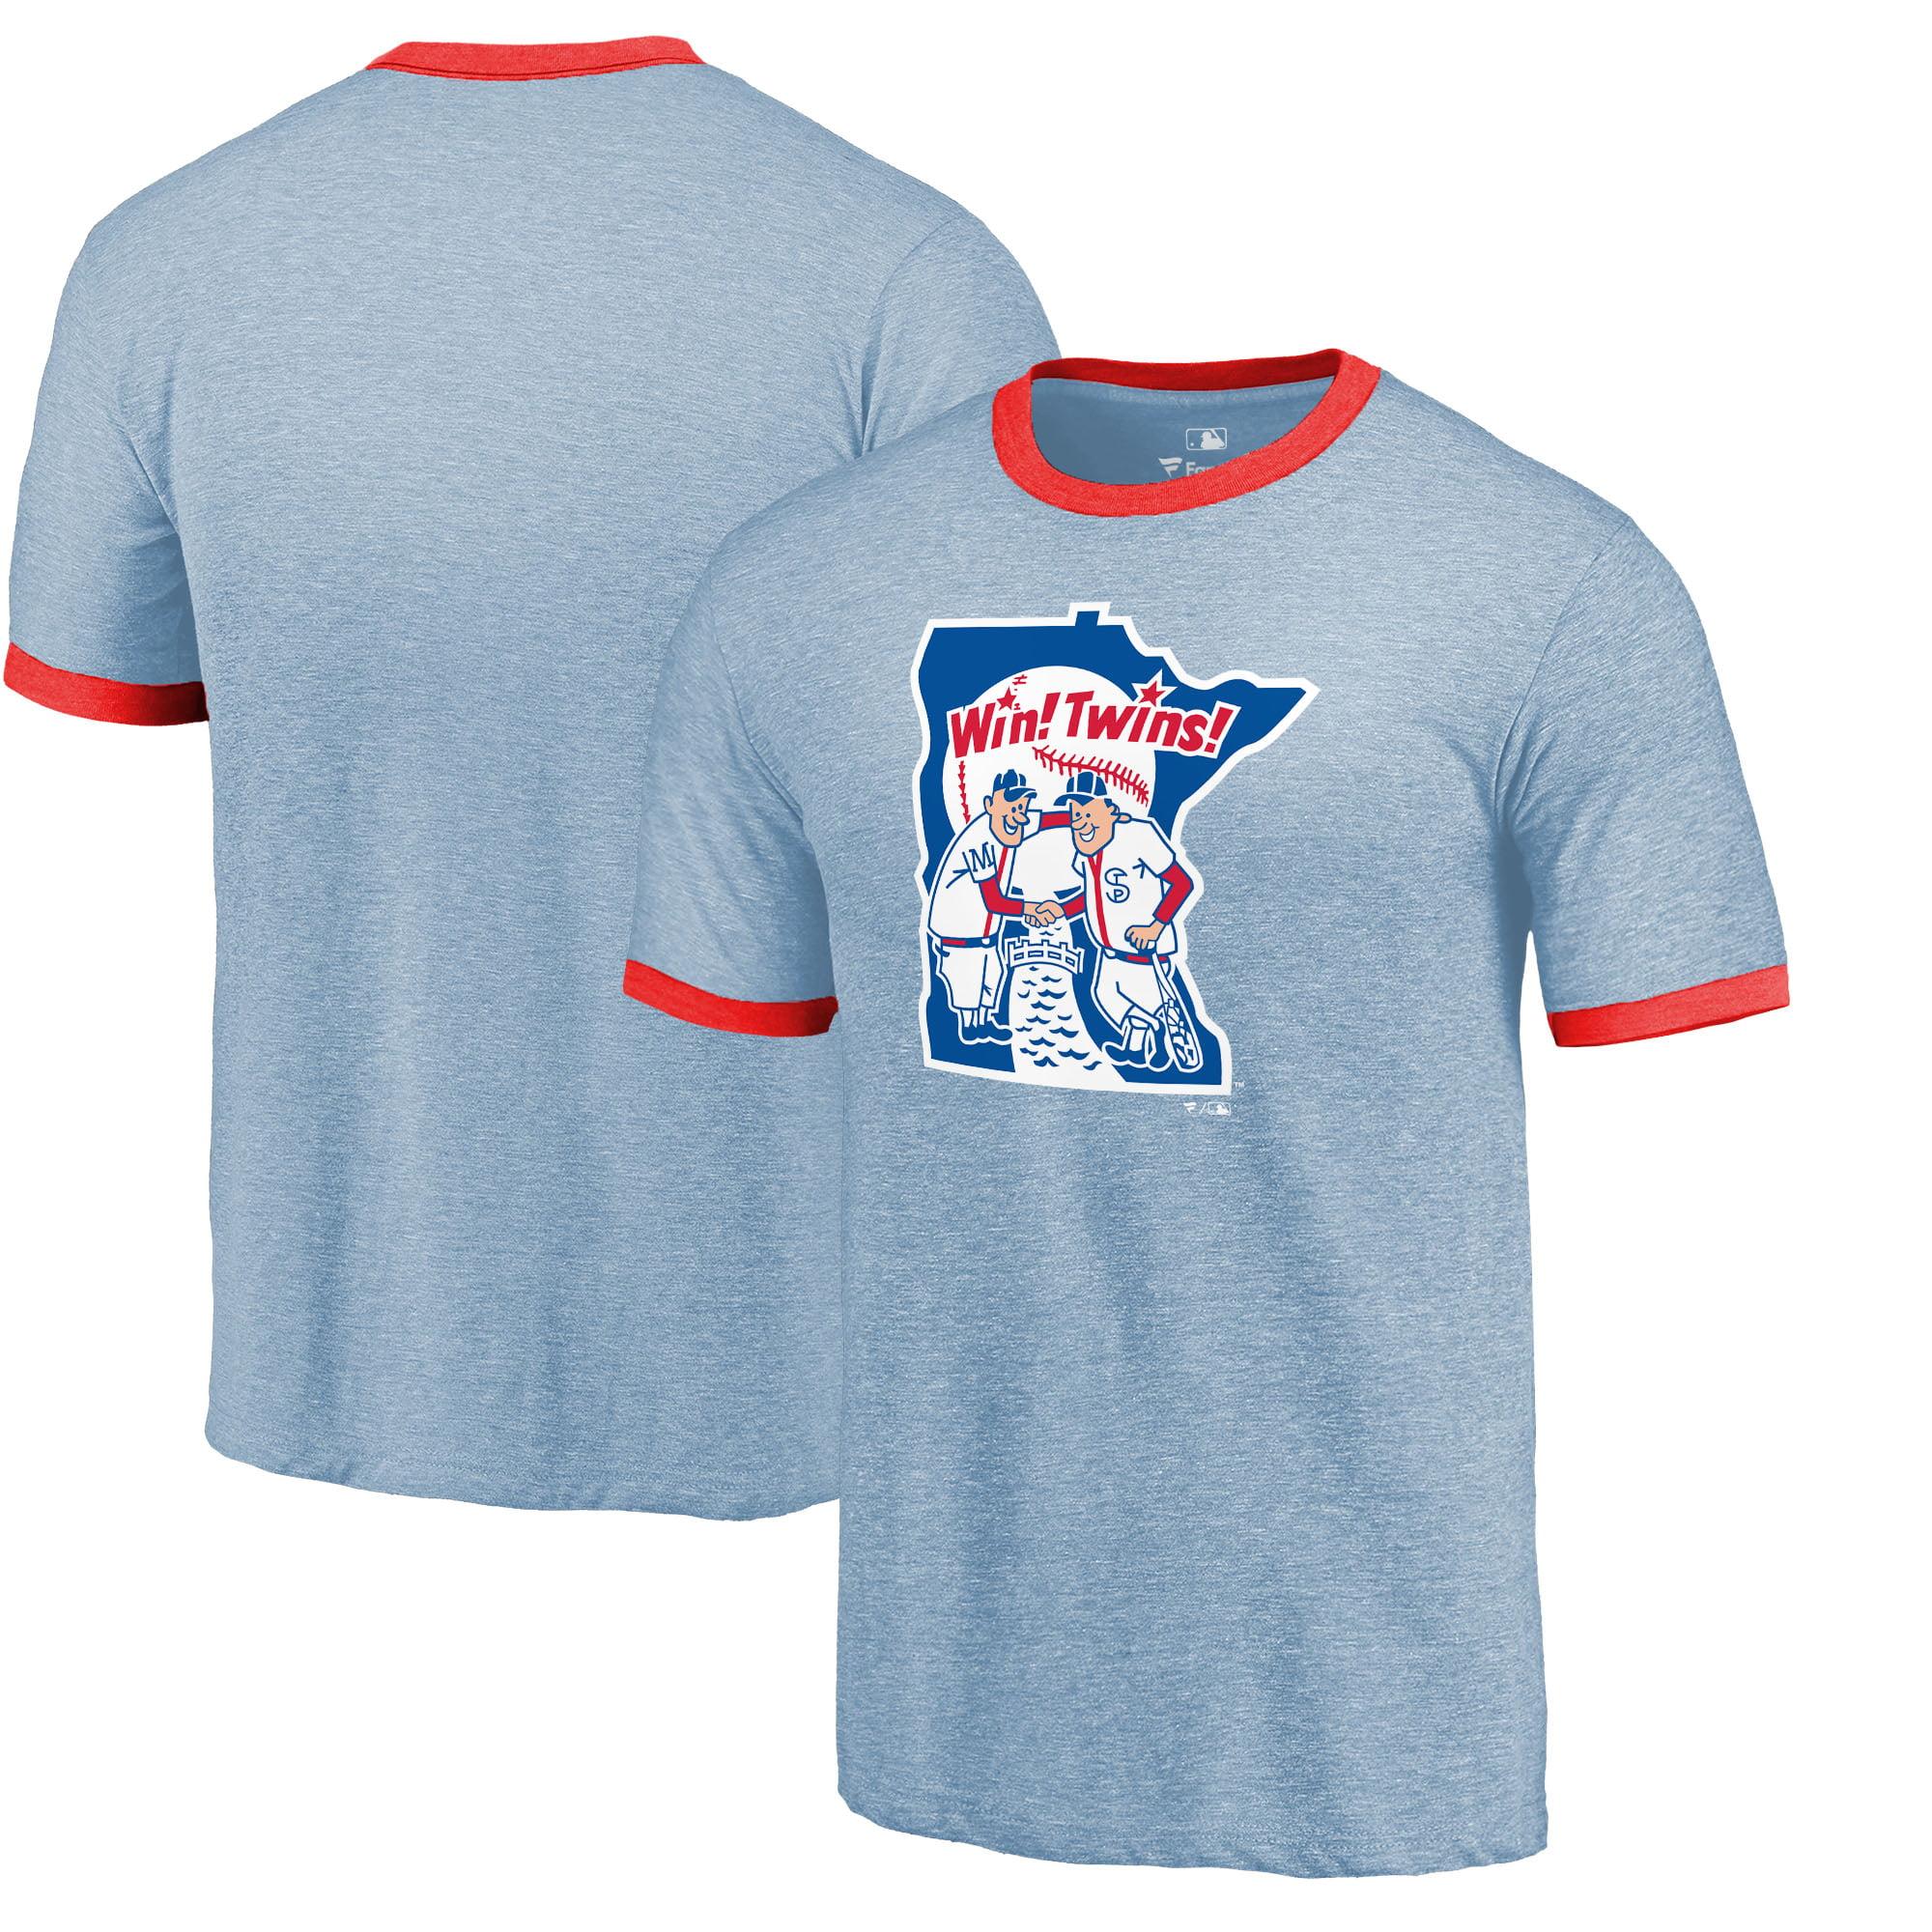 Minnesota Twins Fanatics Branded Refresh Ringer Tri-Blend T-Shirt - Light Blue/Red